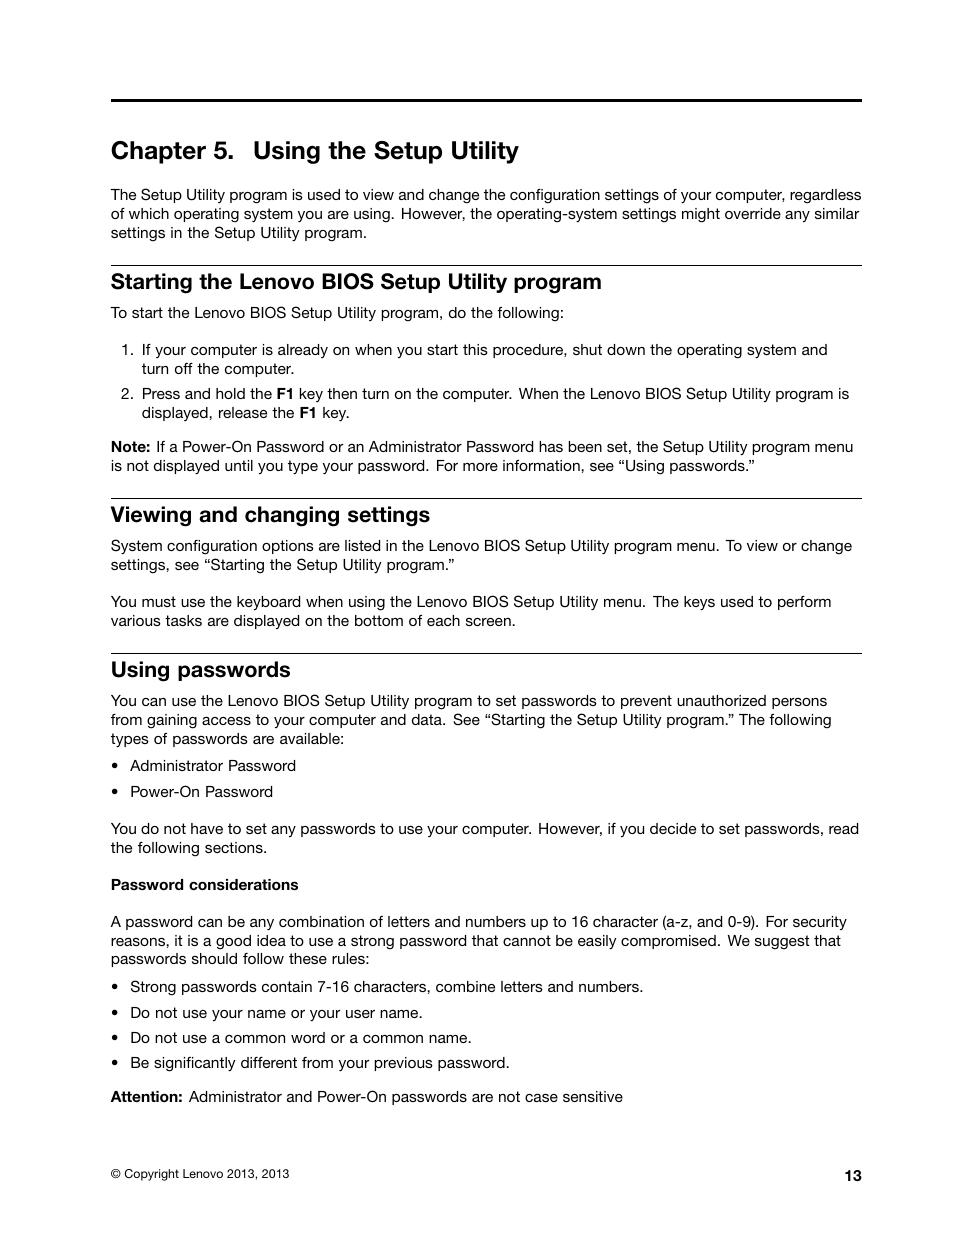 Chapter 5  using the setup utility, Starting the lenovo bios setup